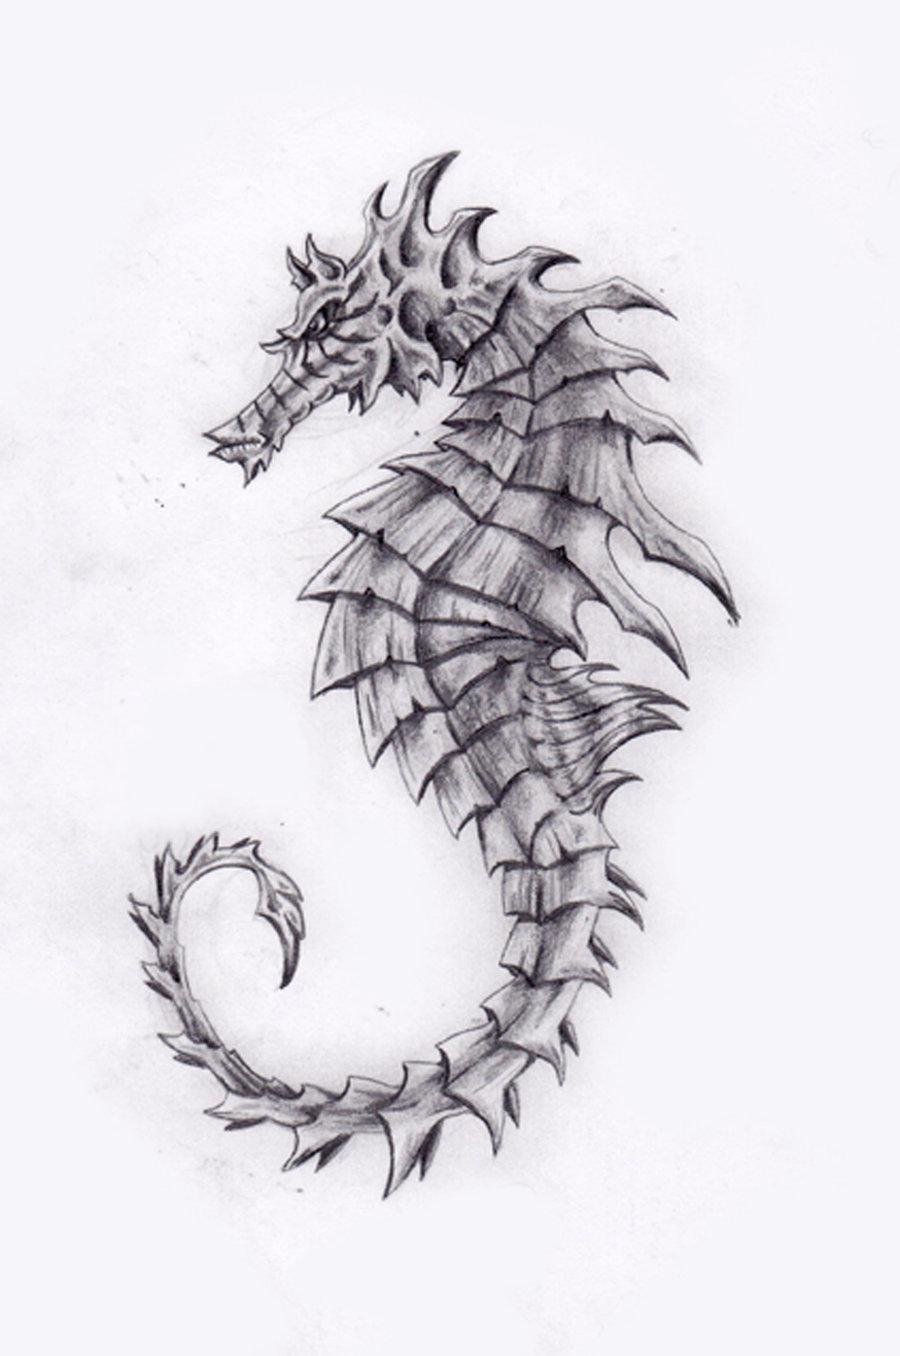 Drawn seahorse deviantart  and Drawing ~roerjm deviantART